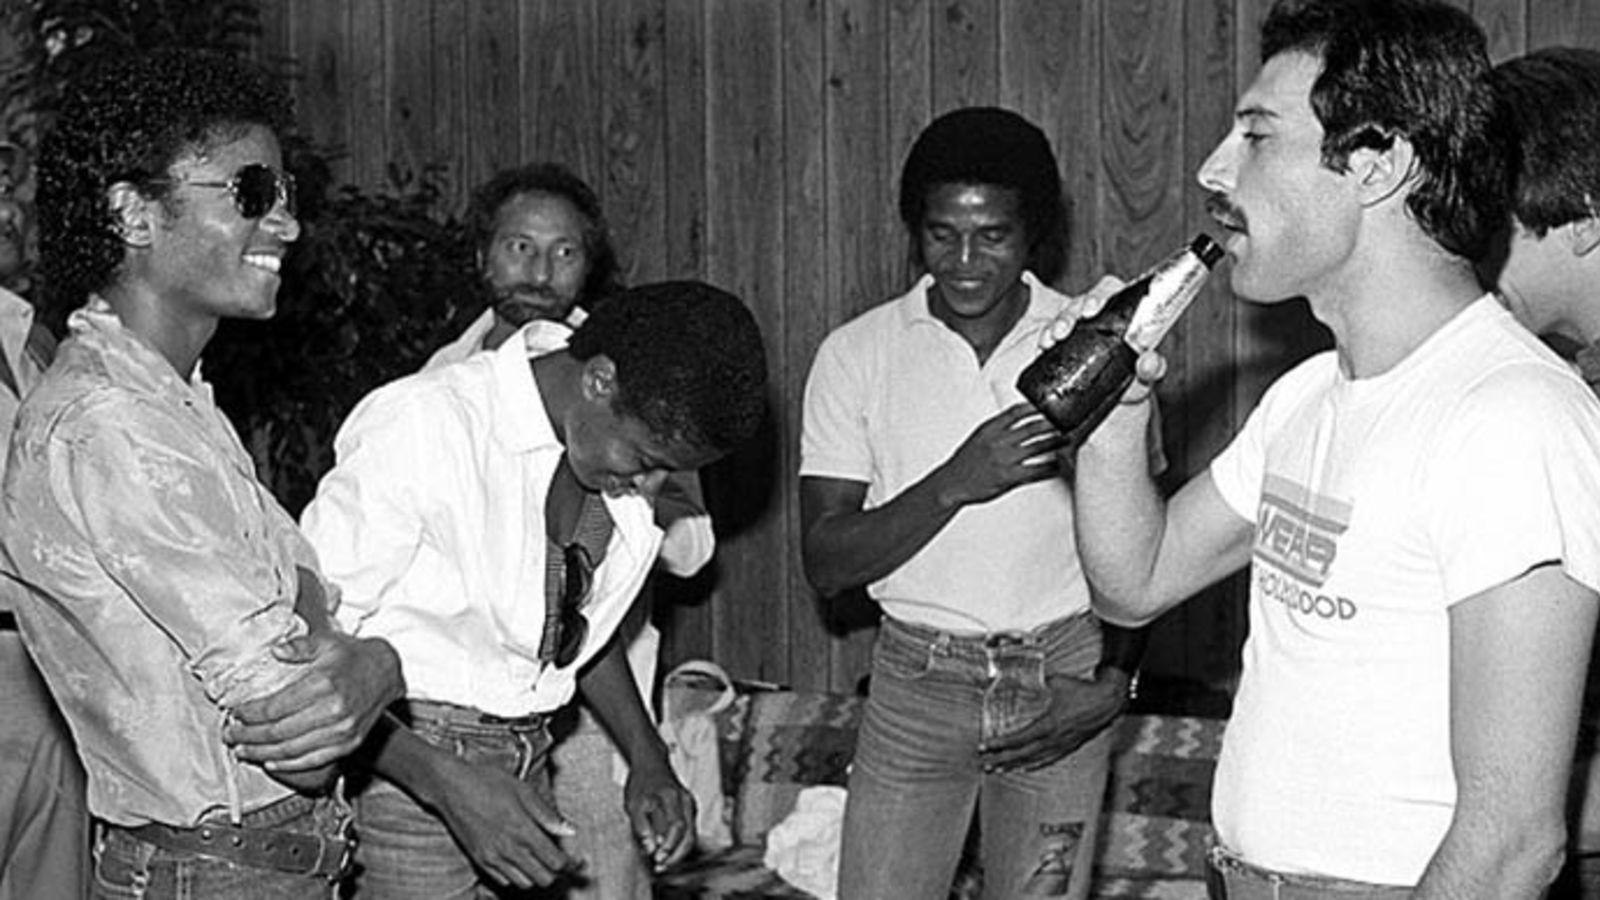 ho7umkcpwtlwfz82ljjr 30 Things You Didn't Know About Freddie Mercury